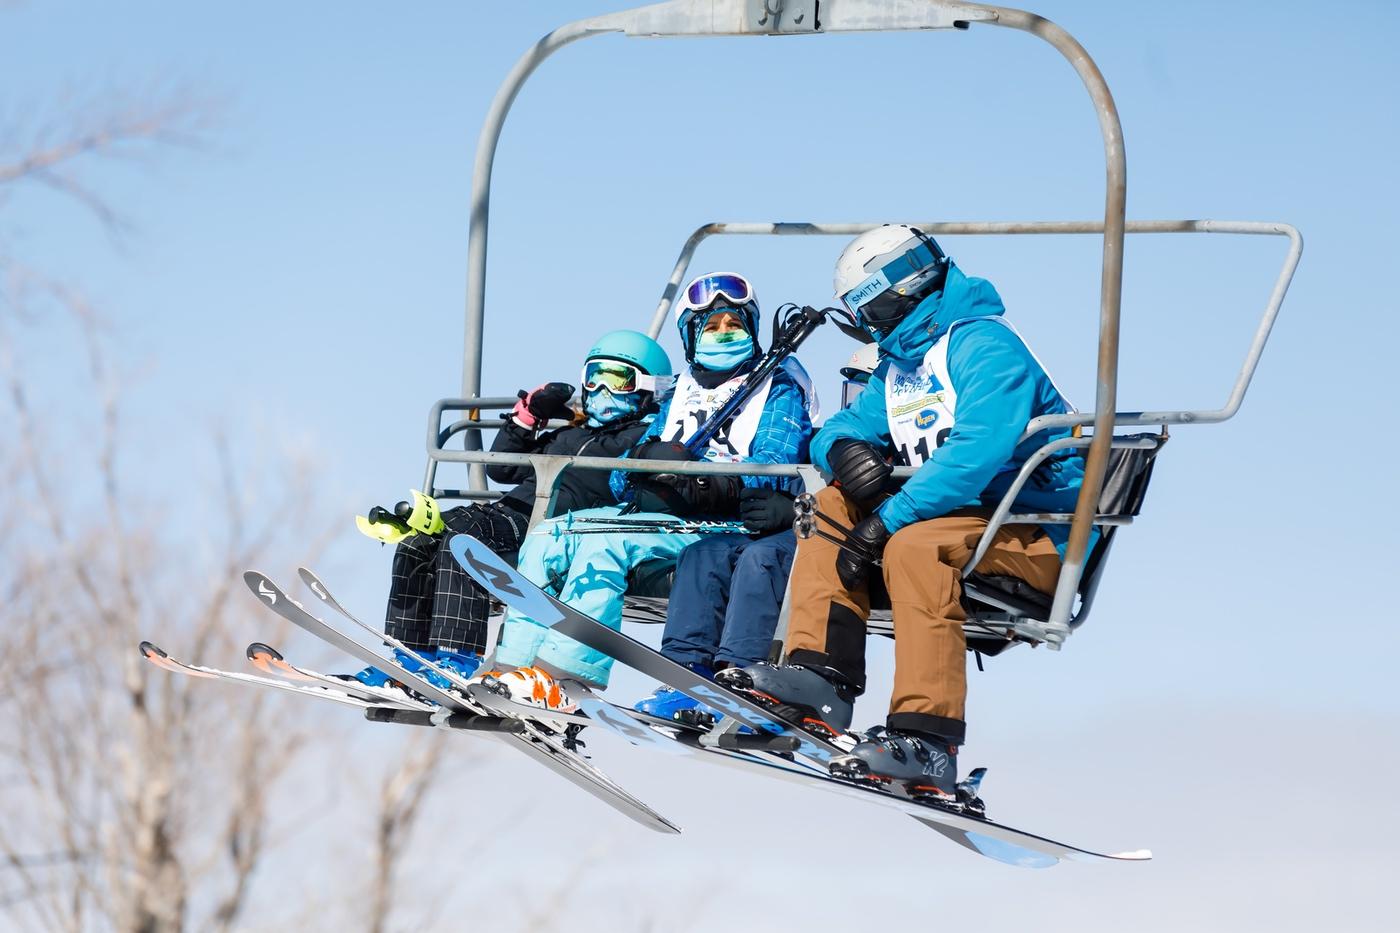 WinterKids Downhill 24 2021 SDP 3070